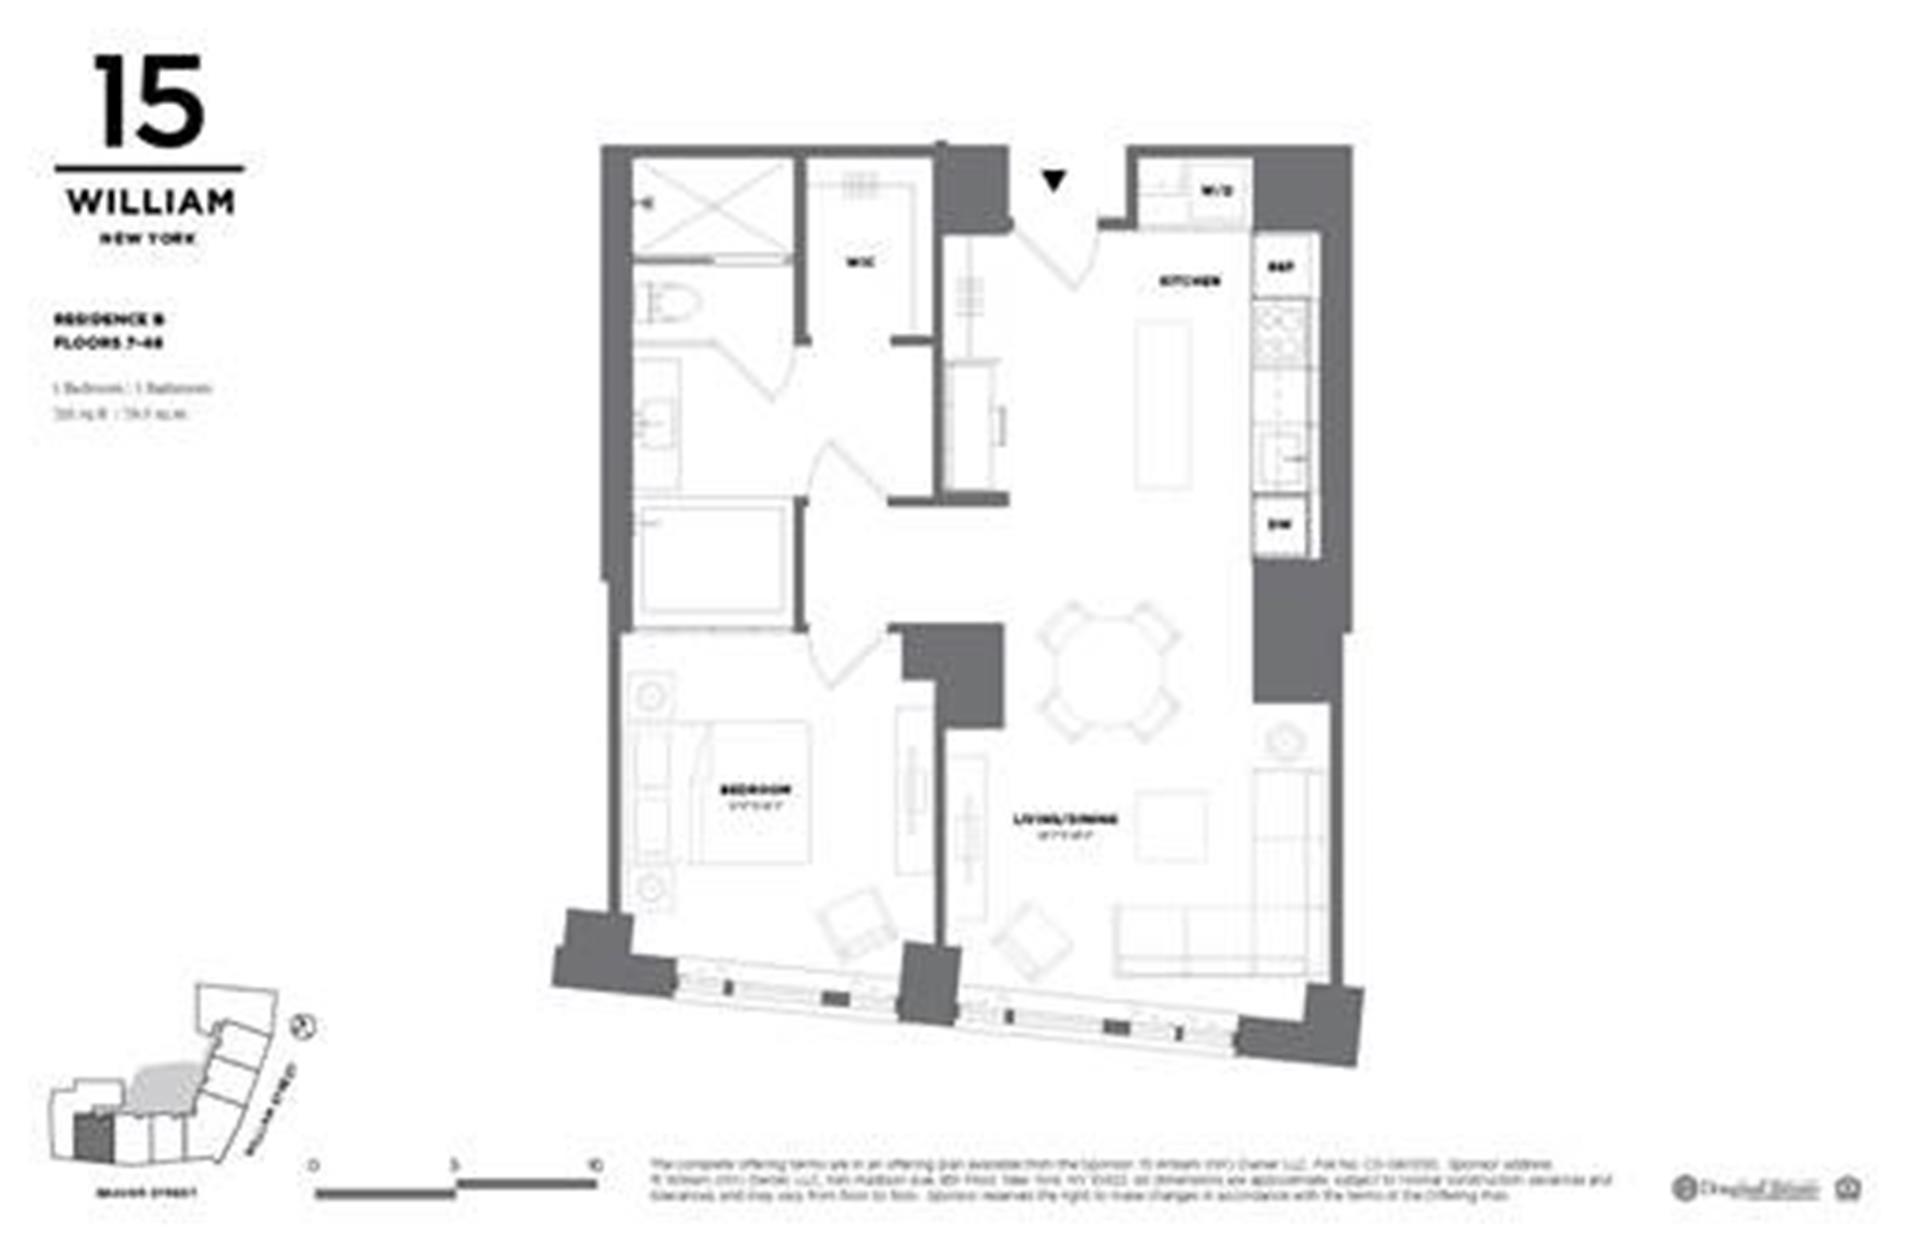 Floor plan of 15 William, 15 William Street, 39I - Financial District, New York